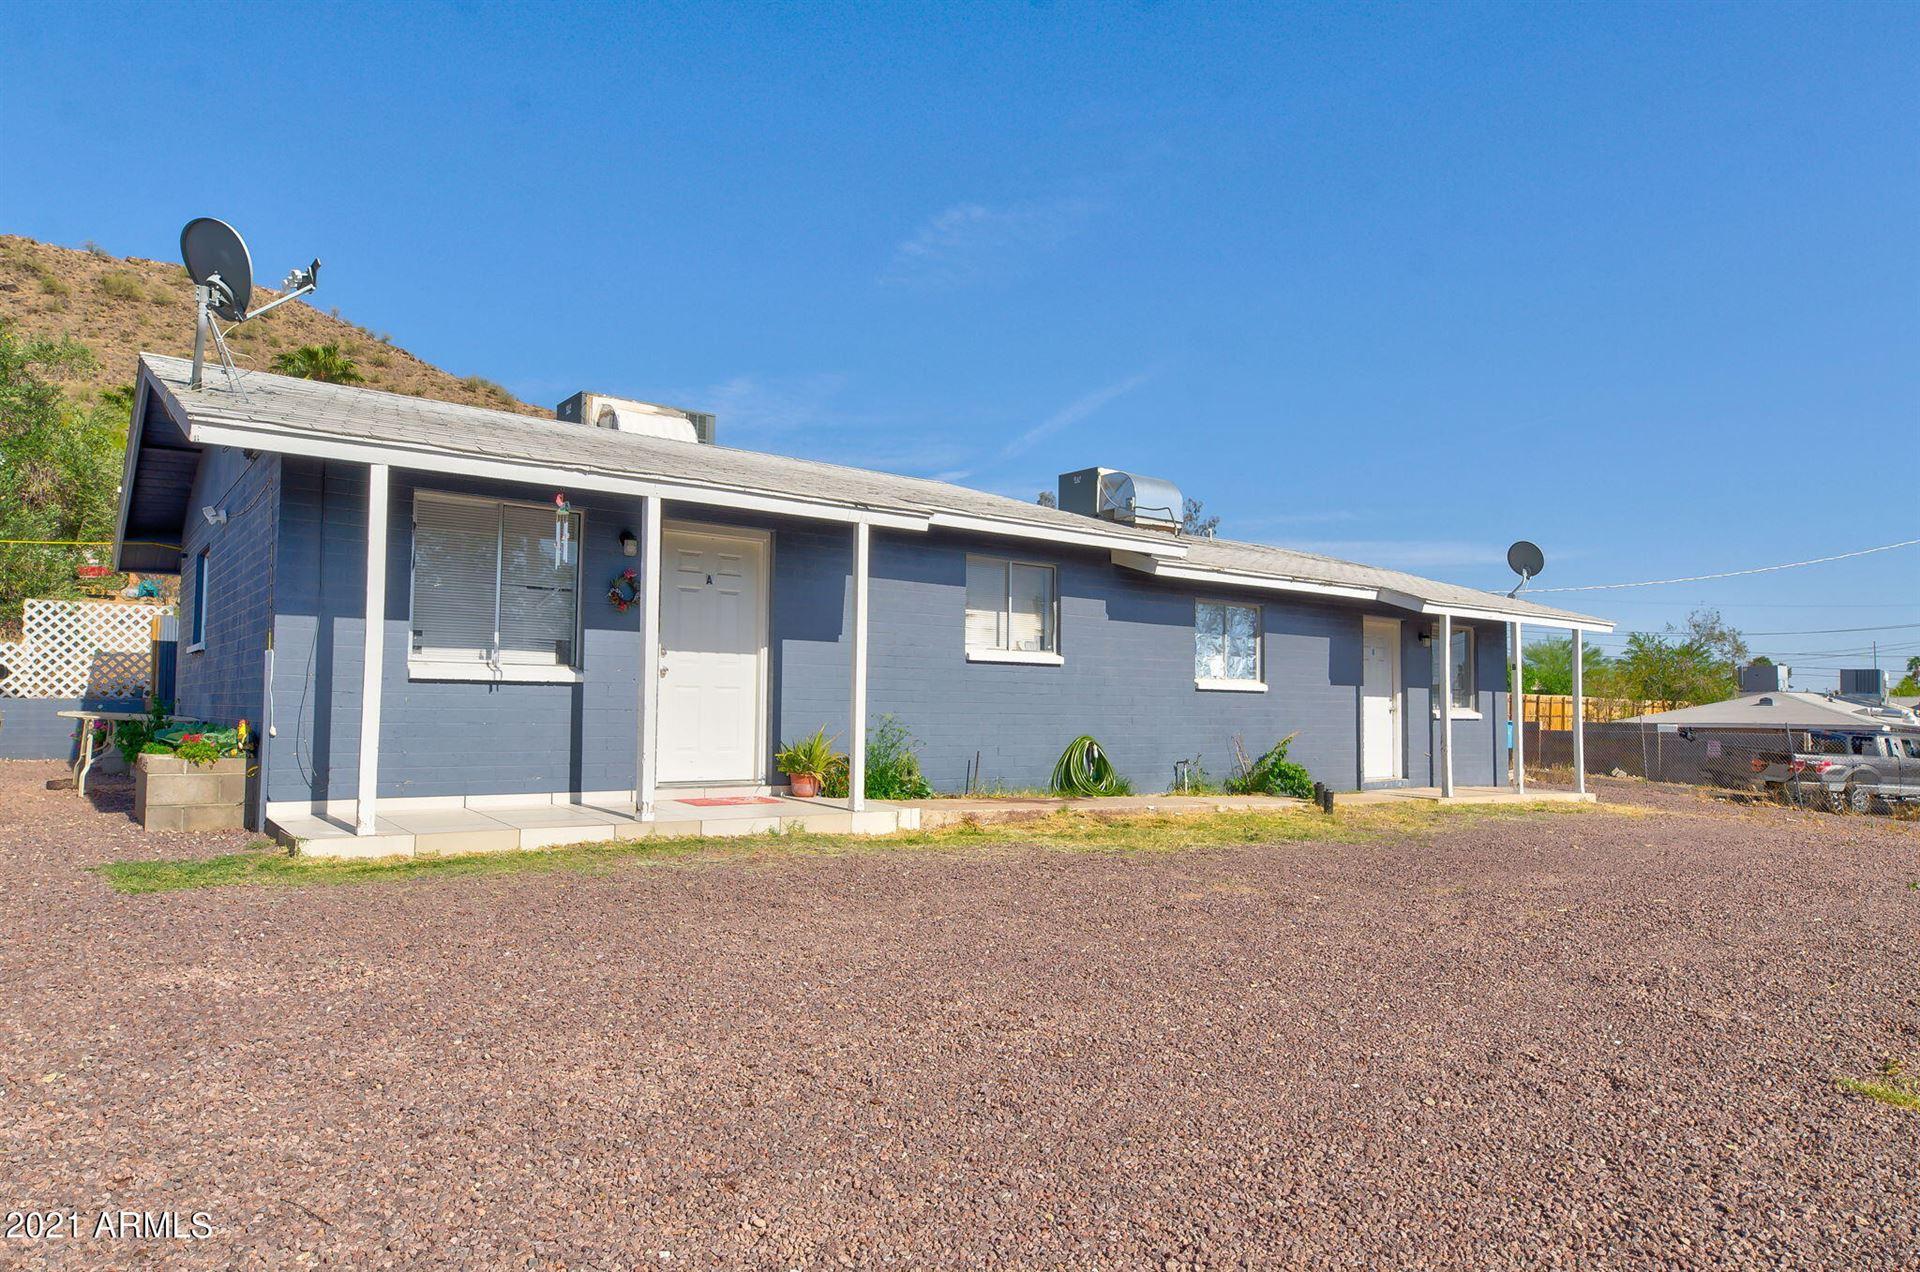 1411 W MERCER Lane, Phoenix, AZ 85029 - MLS#: 6234775